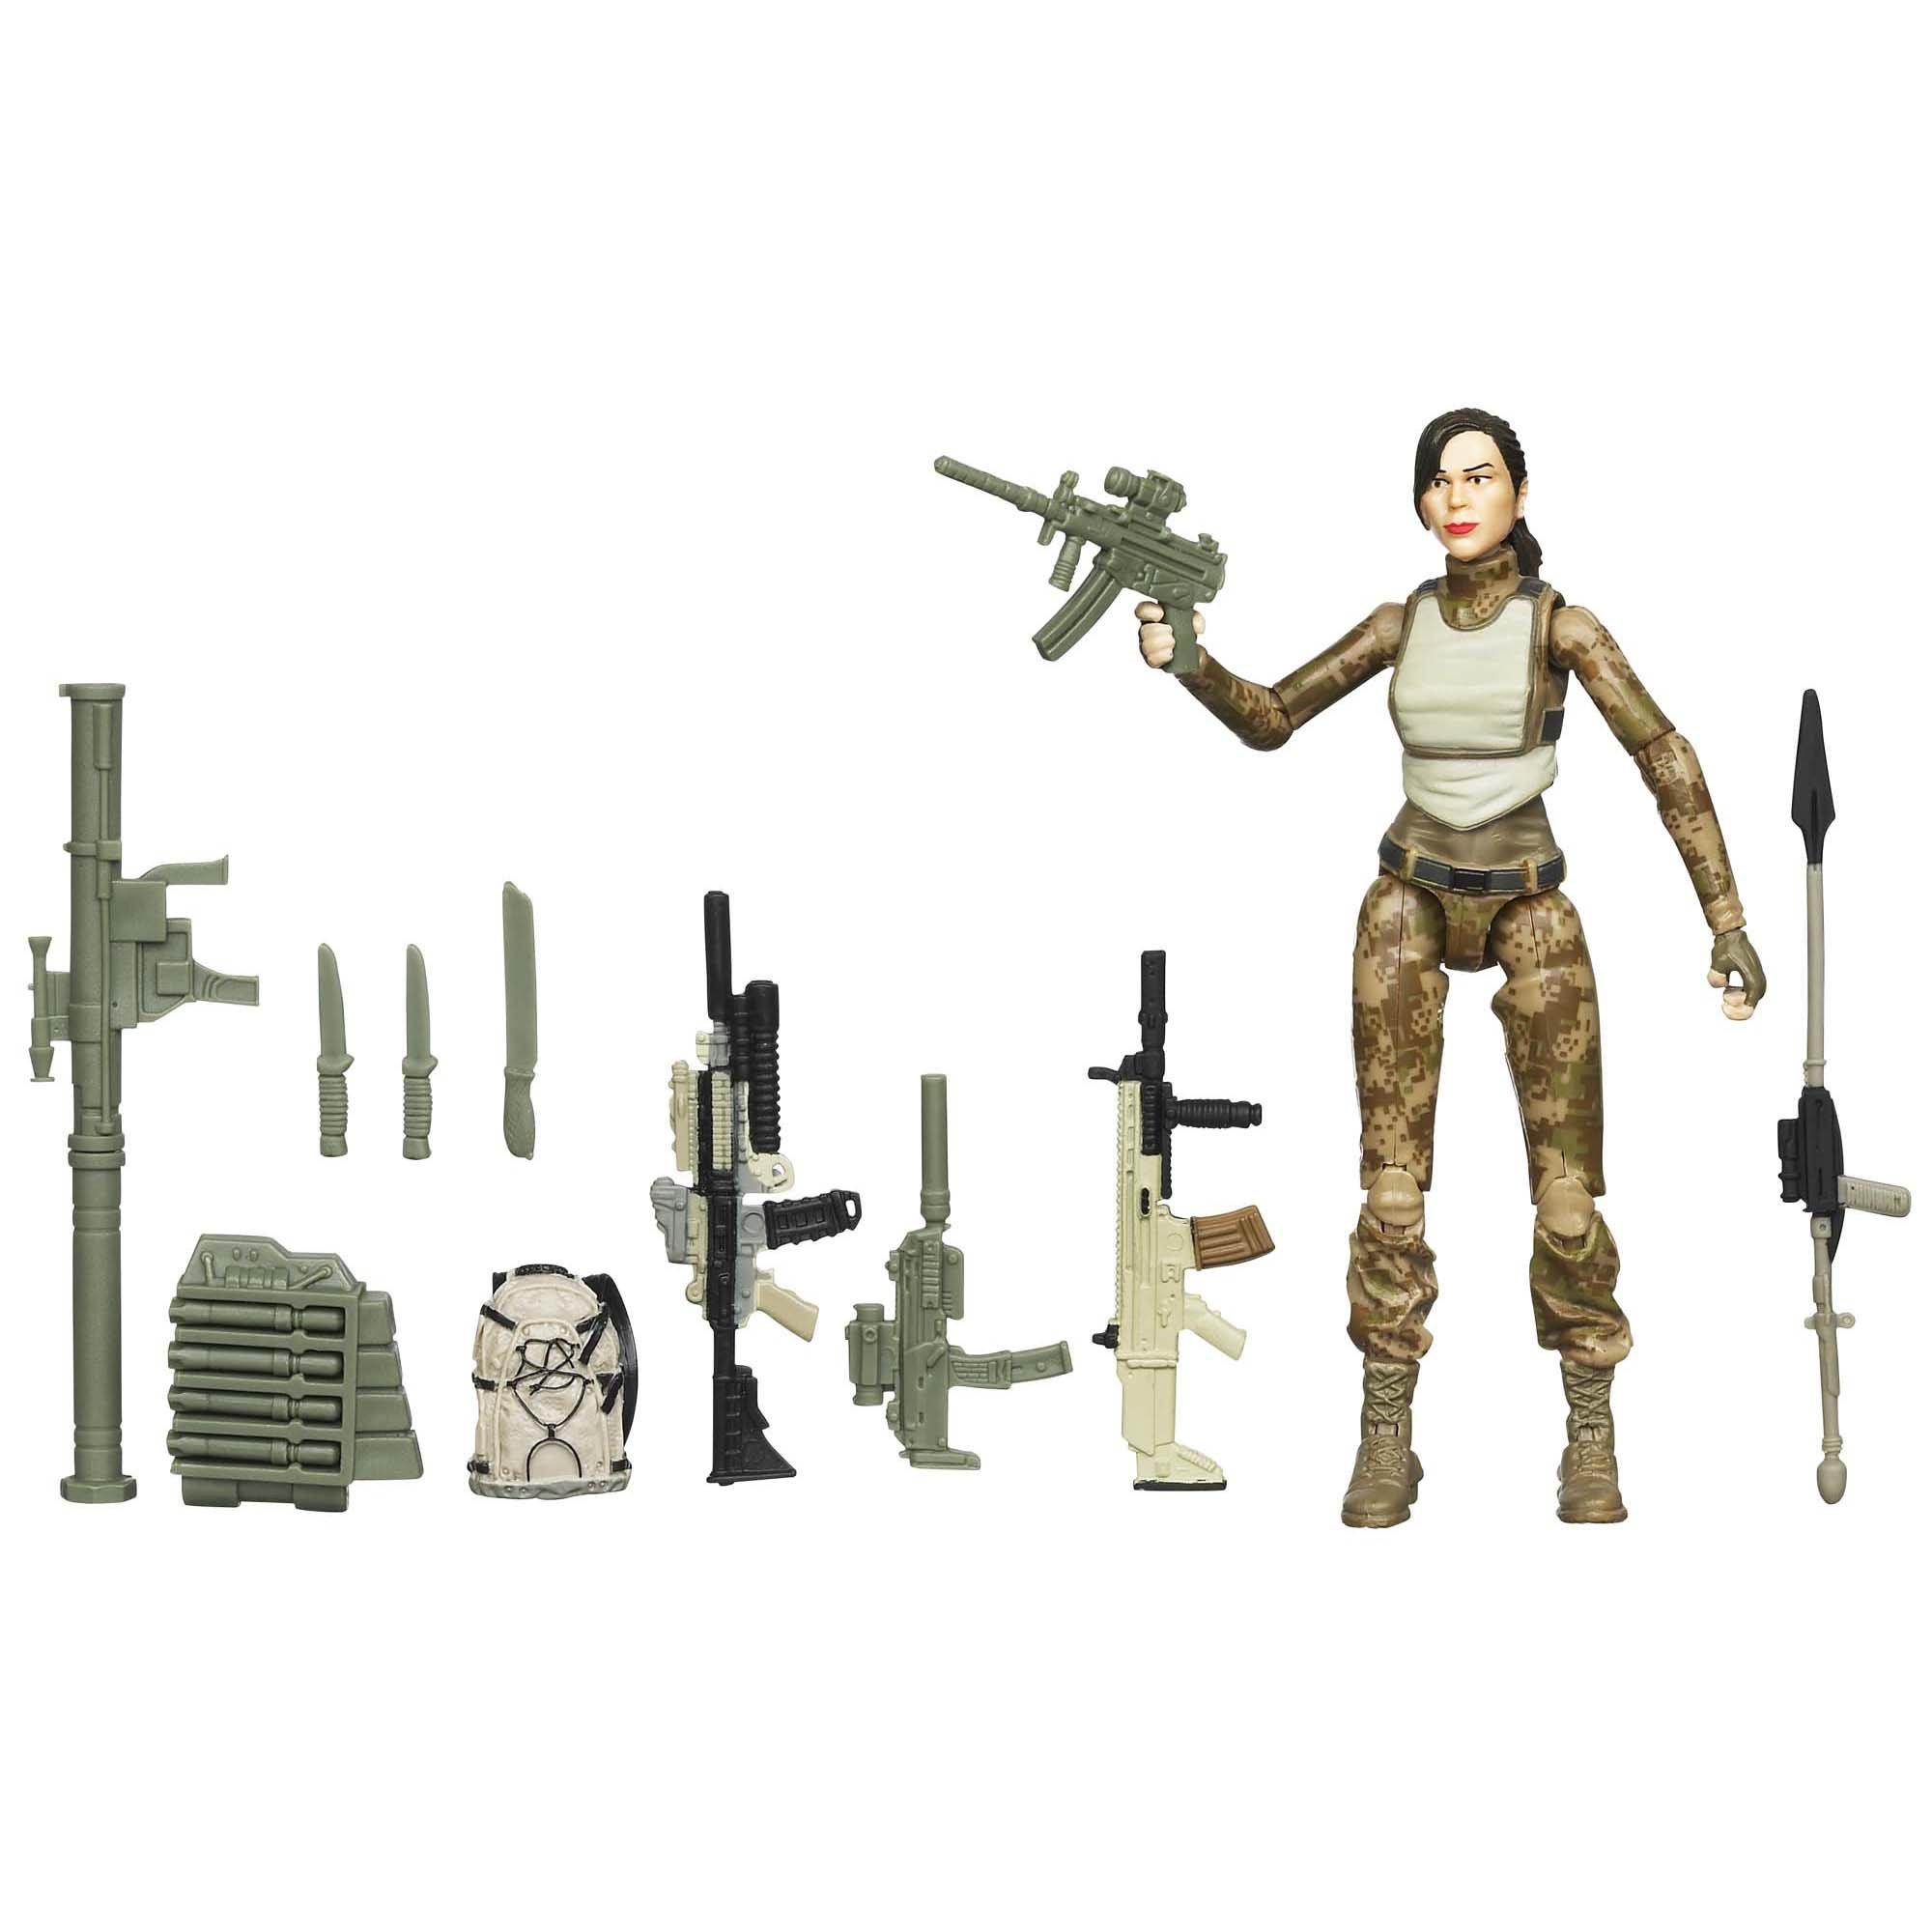 G.I. Joe Retaliation Lady Jaye Figure